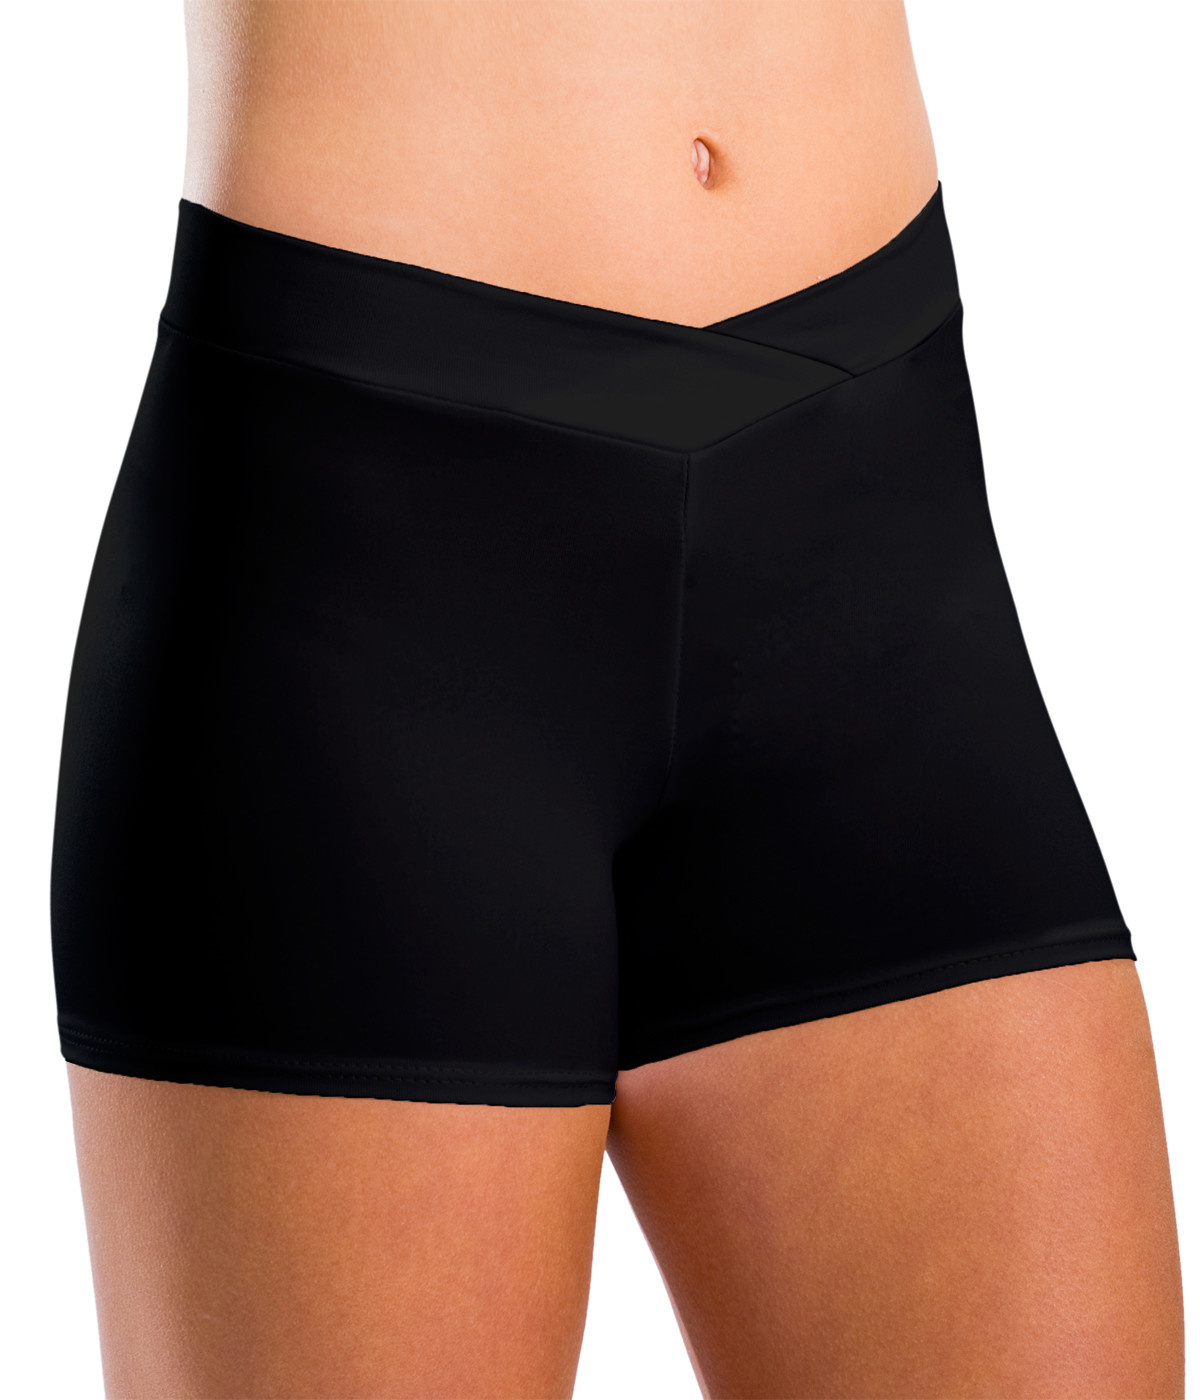 Motionwear 7113 V-waist Dance Short for Adults